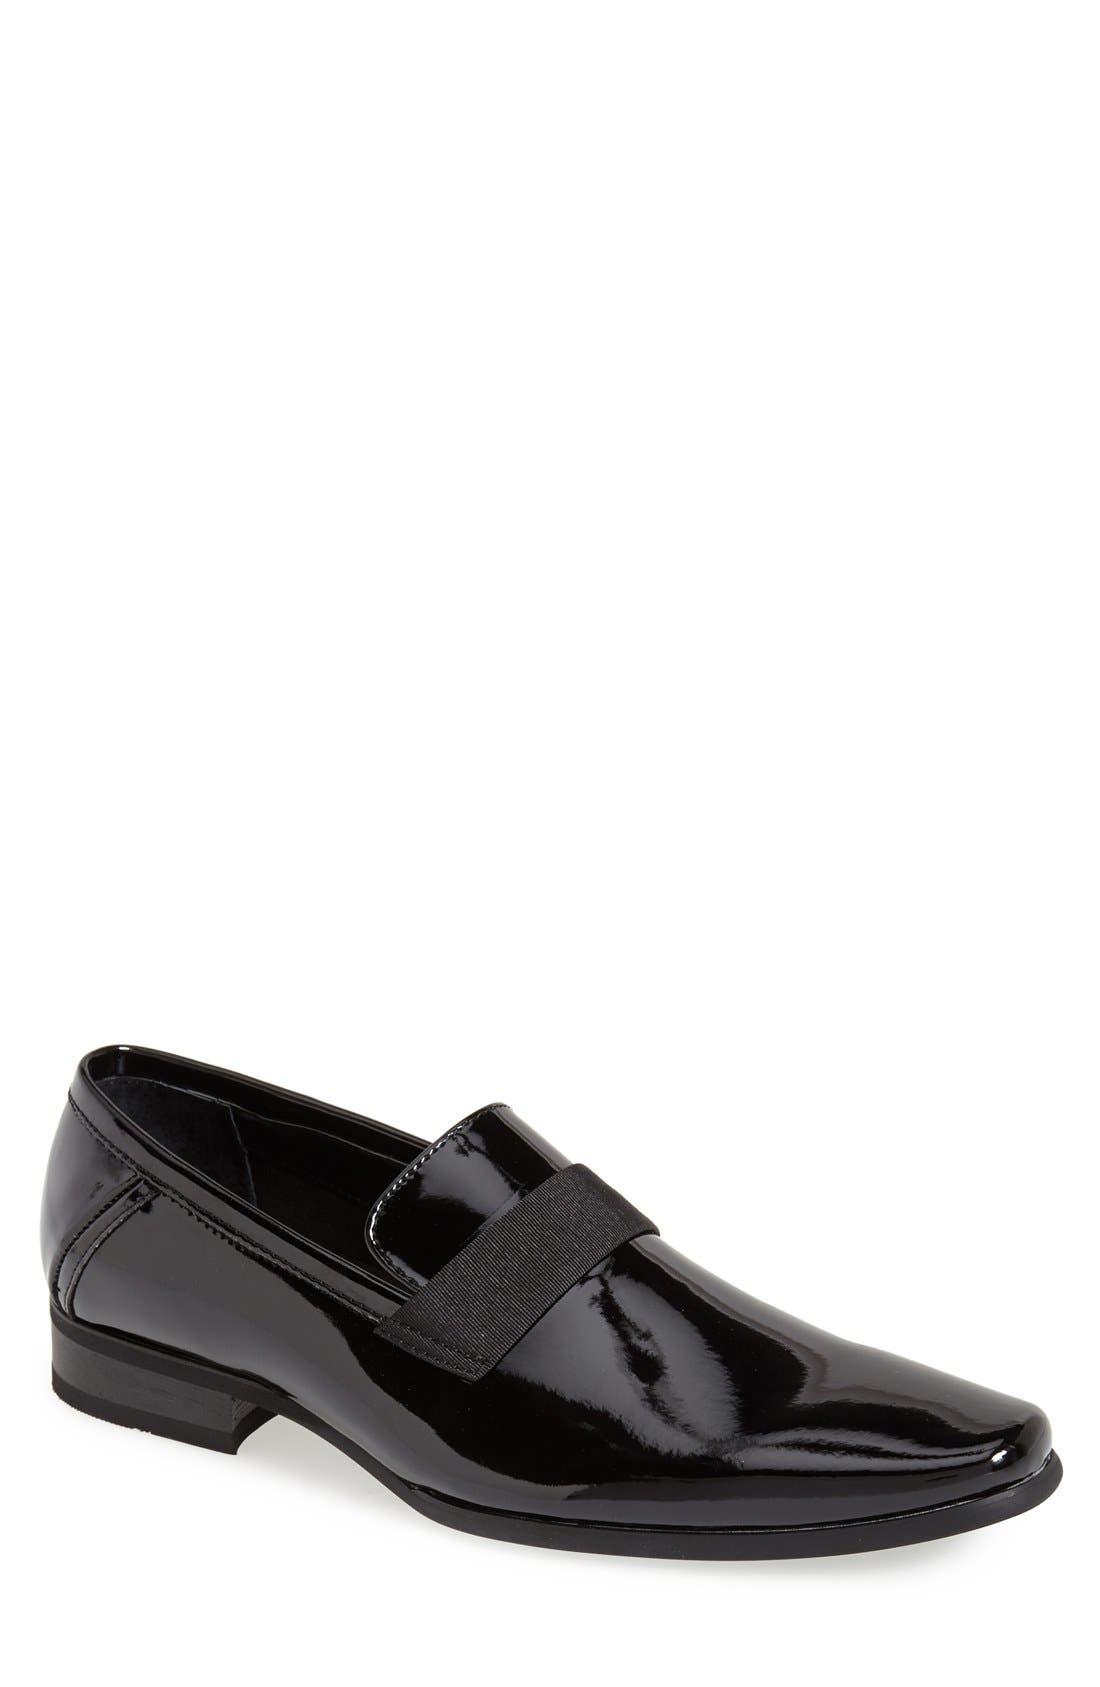 CALVIN KLEIN,                             'Bernard' Venetian Loafer,                             Main thumbnail 1, color,                             BLACK